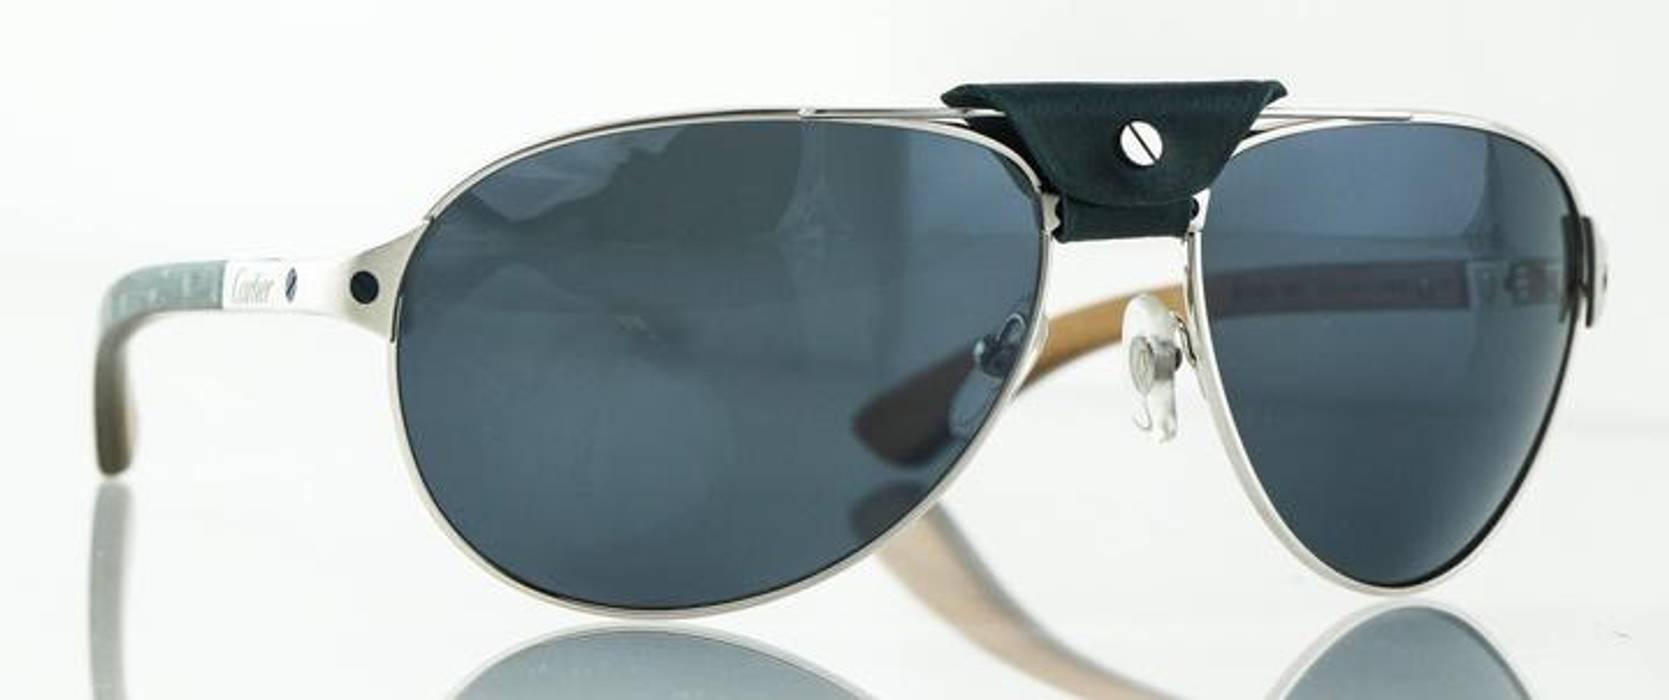 3092eca462 Cartier. Louro Faya Wood Ruthenium Finish Edition Santos-Dumont Sunglasses